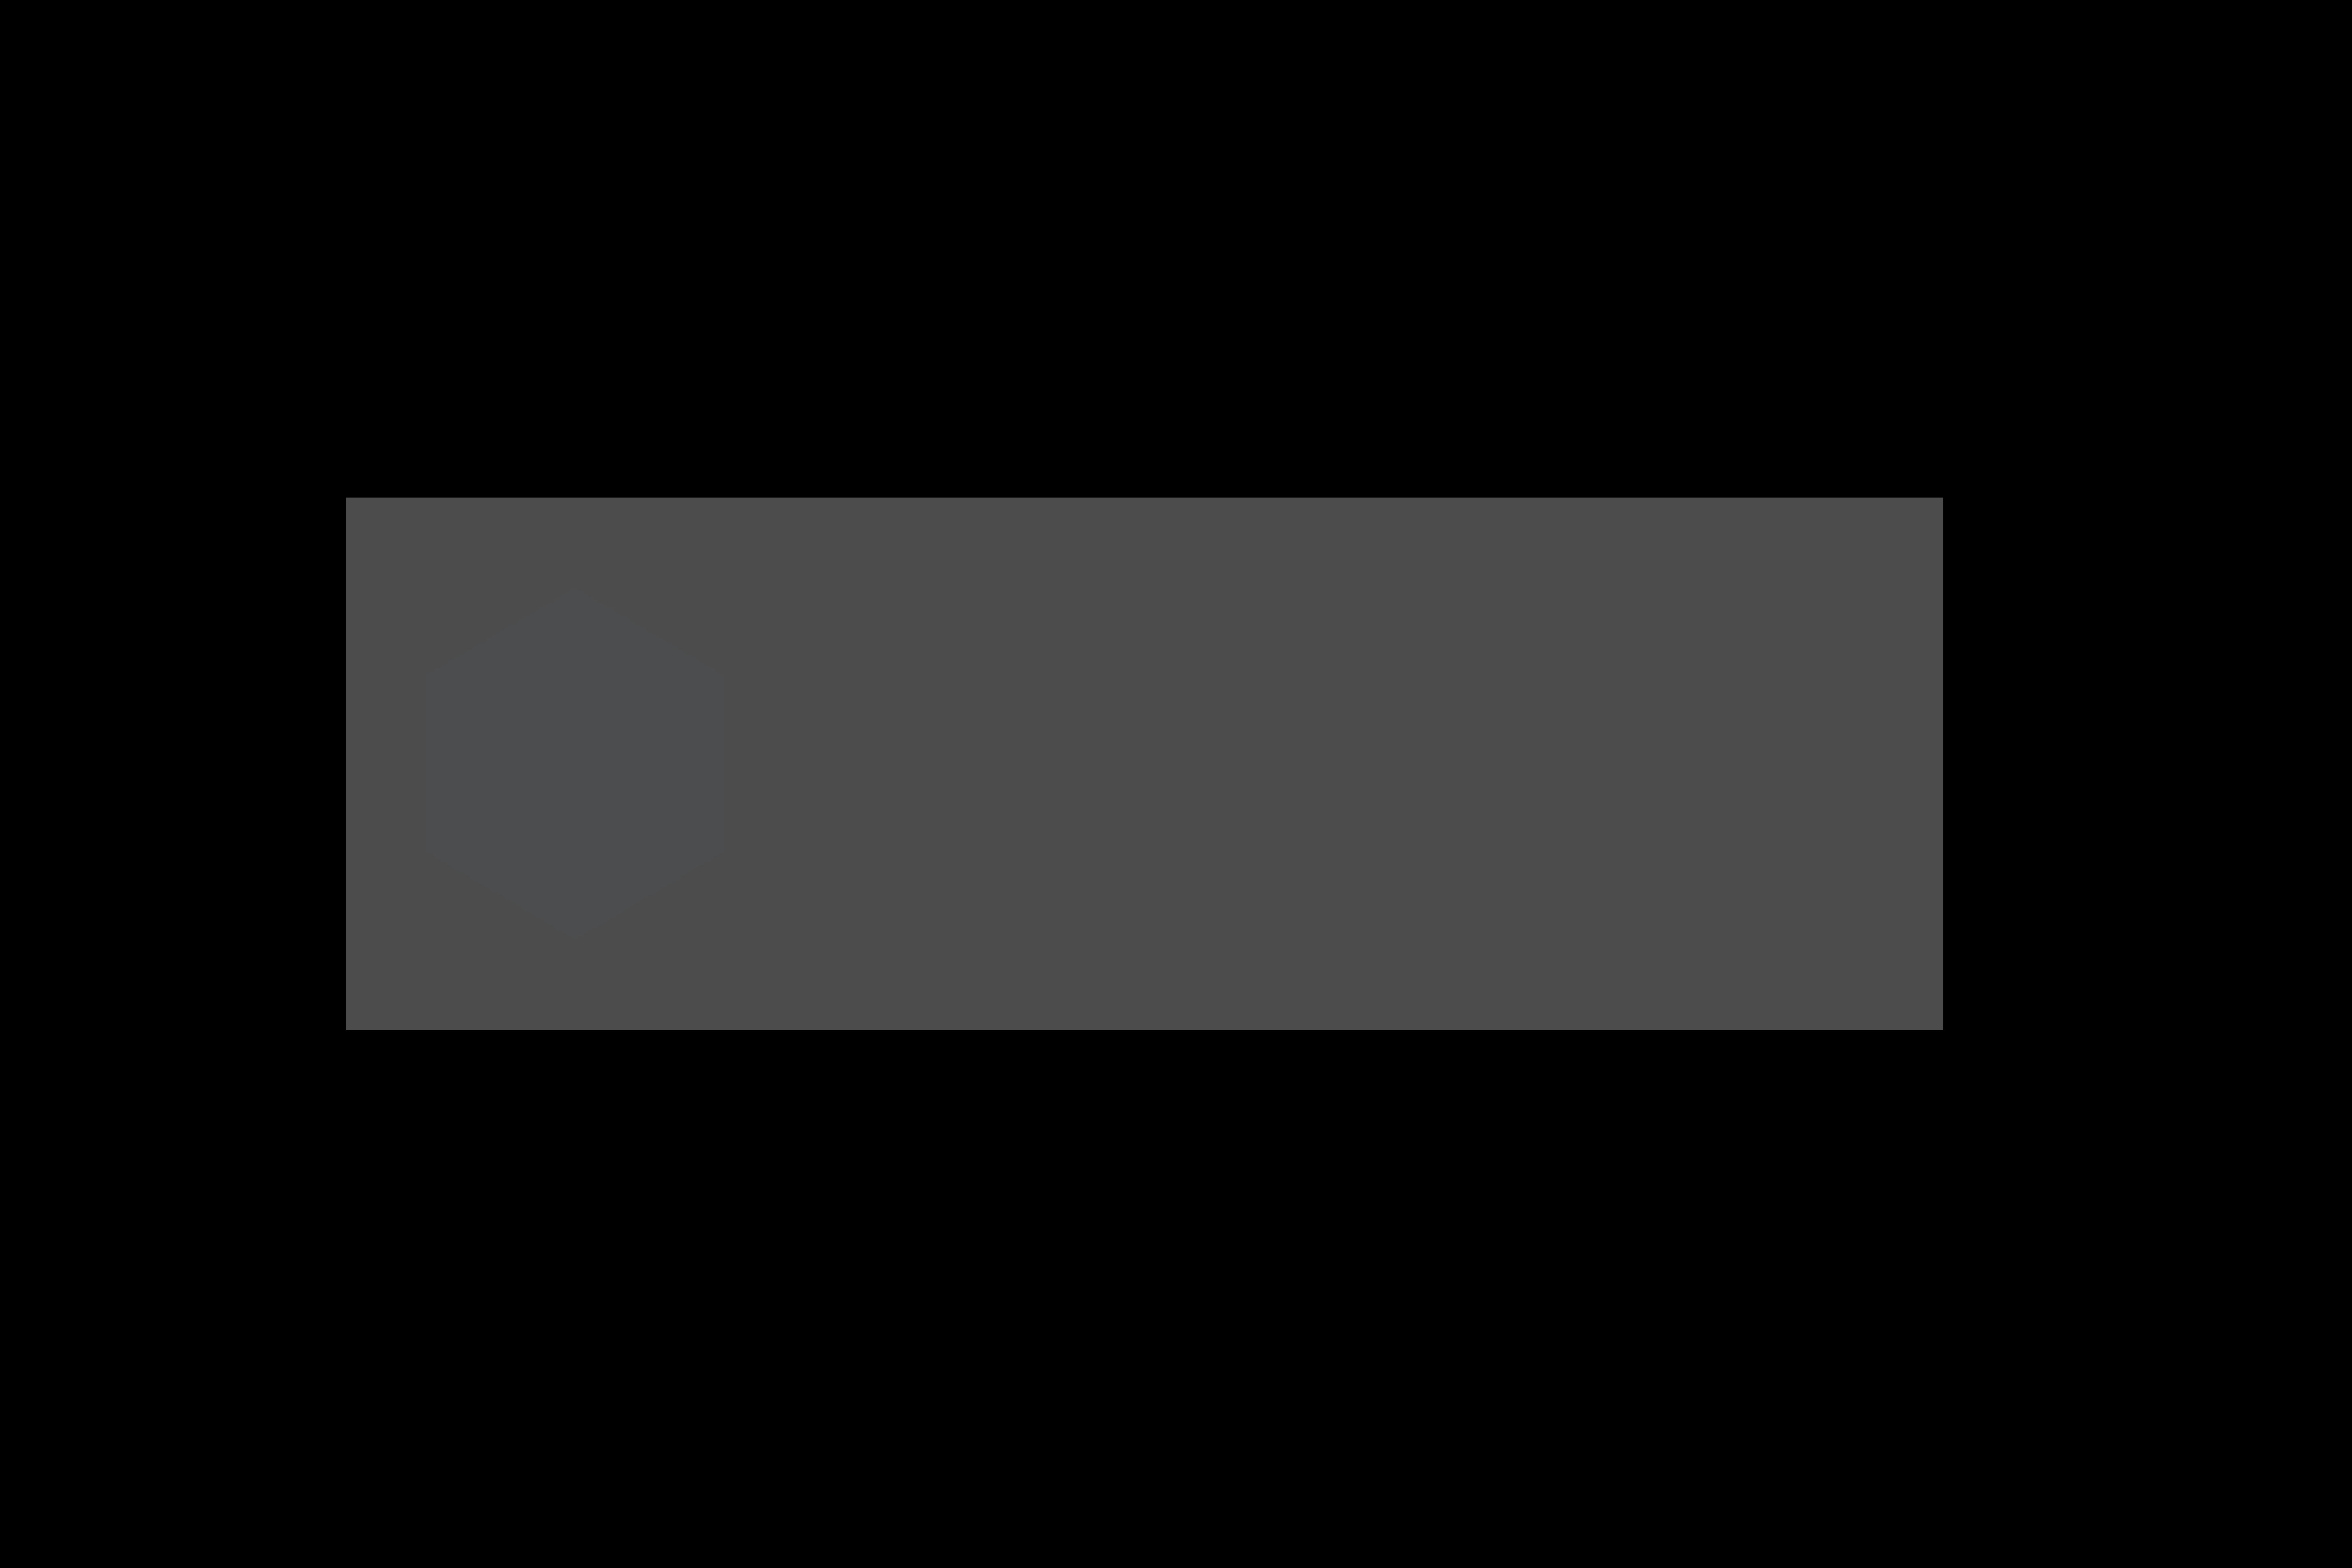 BIM InterOp